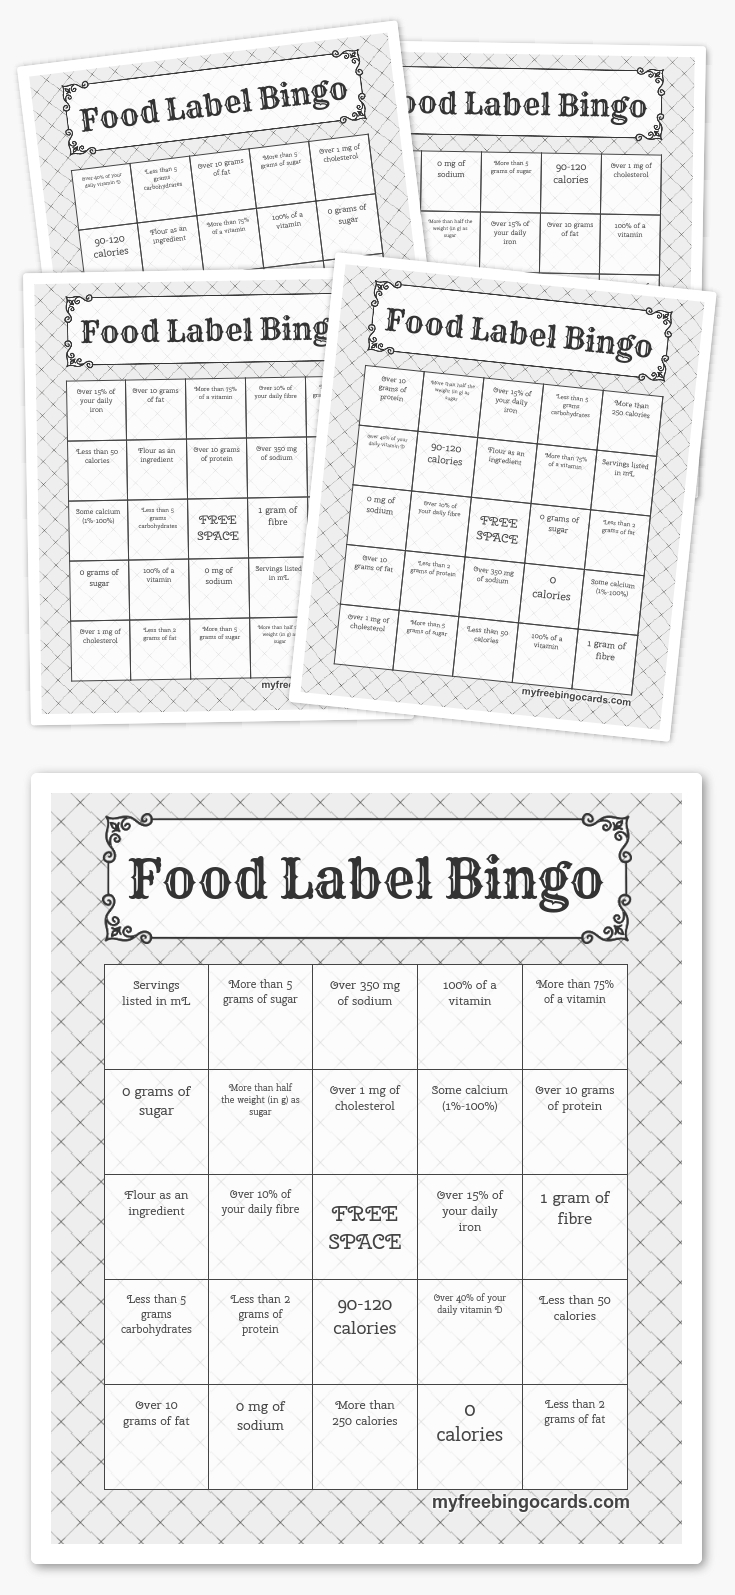 Free Printable Bingo Cards | Teaching | Free Printable Bingo Cards - Free Printable Bingo Cards 1 100